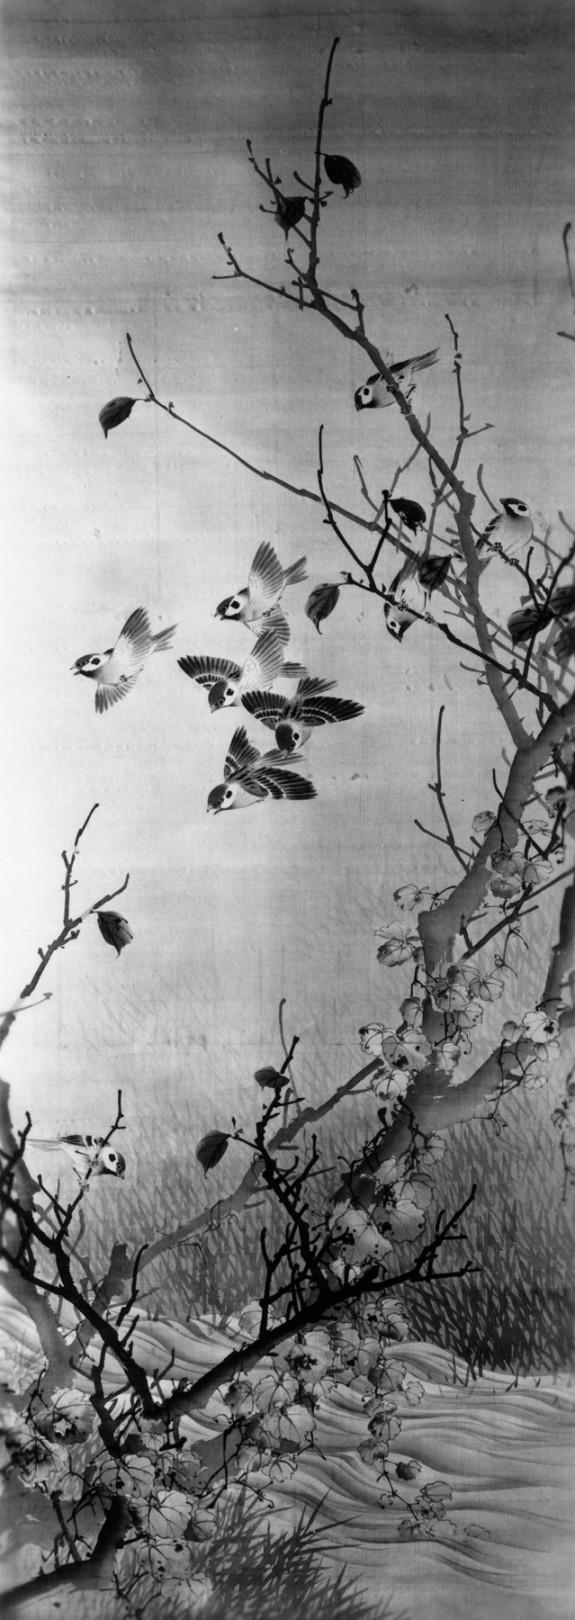 Nine Sparrows in Autumn Foliage